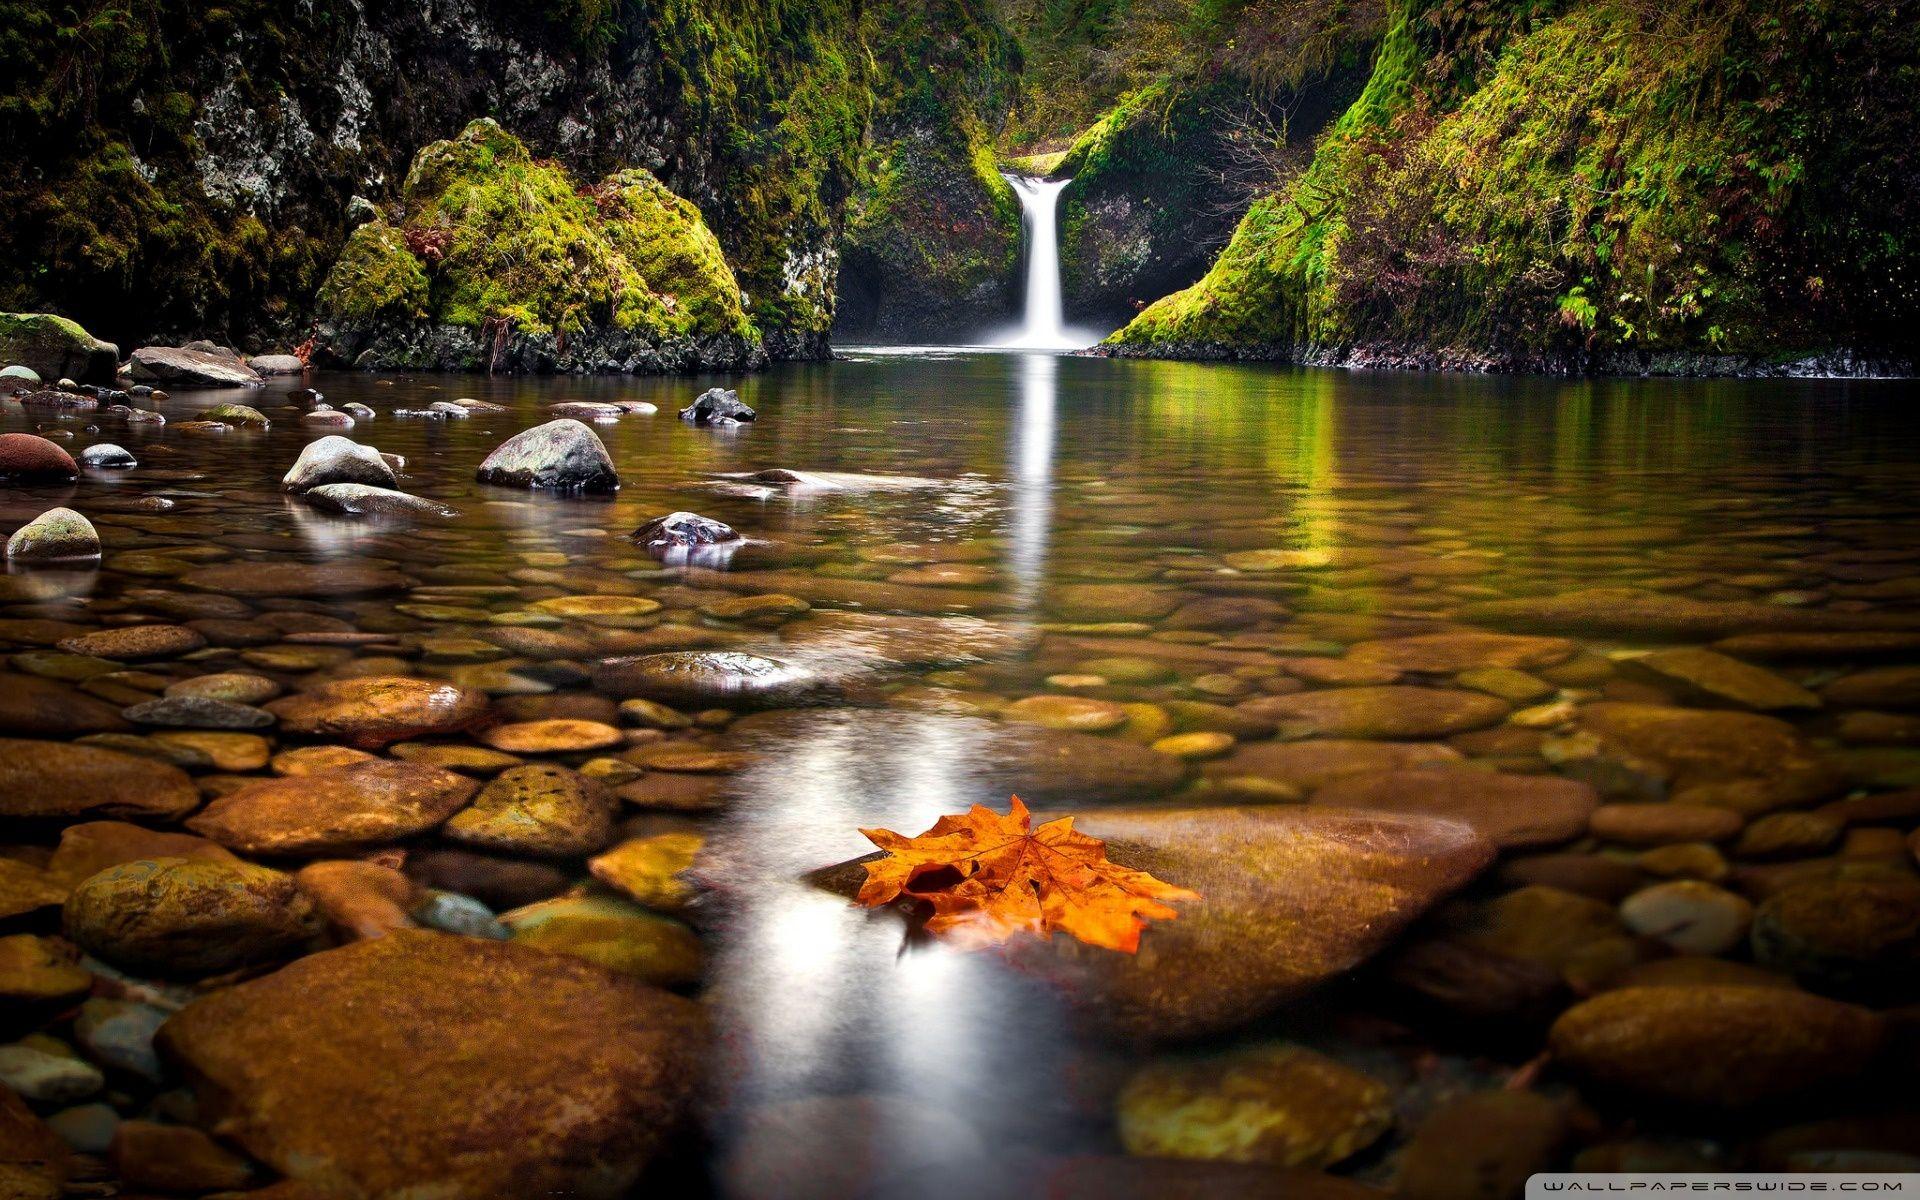 Yellow Leaf In The River Hd Desktop Wallpaper High Definition Waterfall Wallpaper Autumn Waterfalls Waterfall